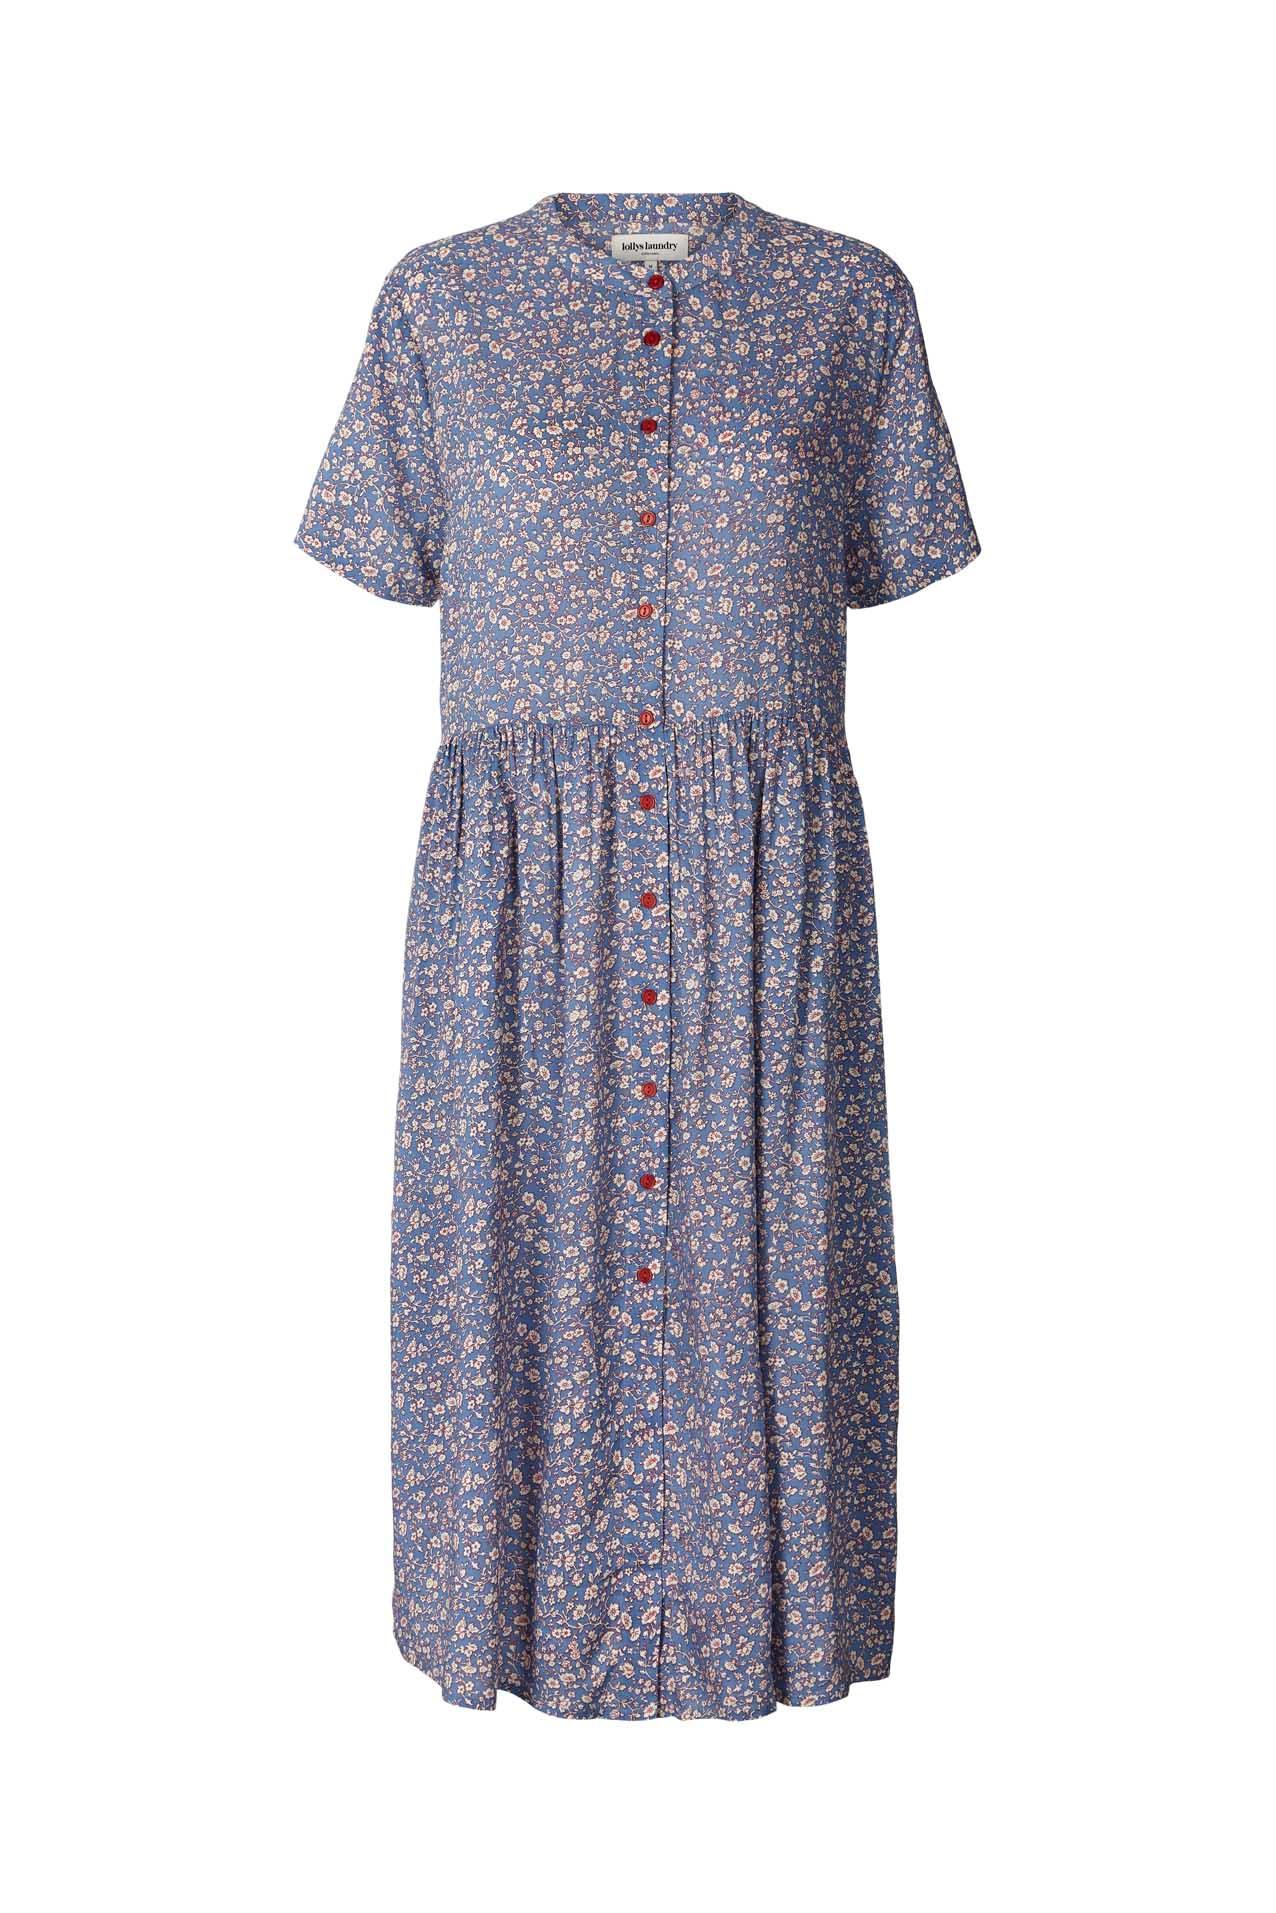 Lollys Laundry Aliya kjole